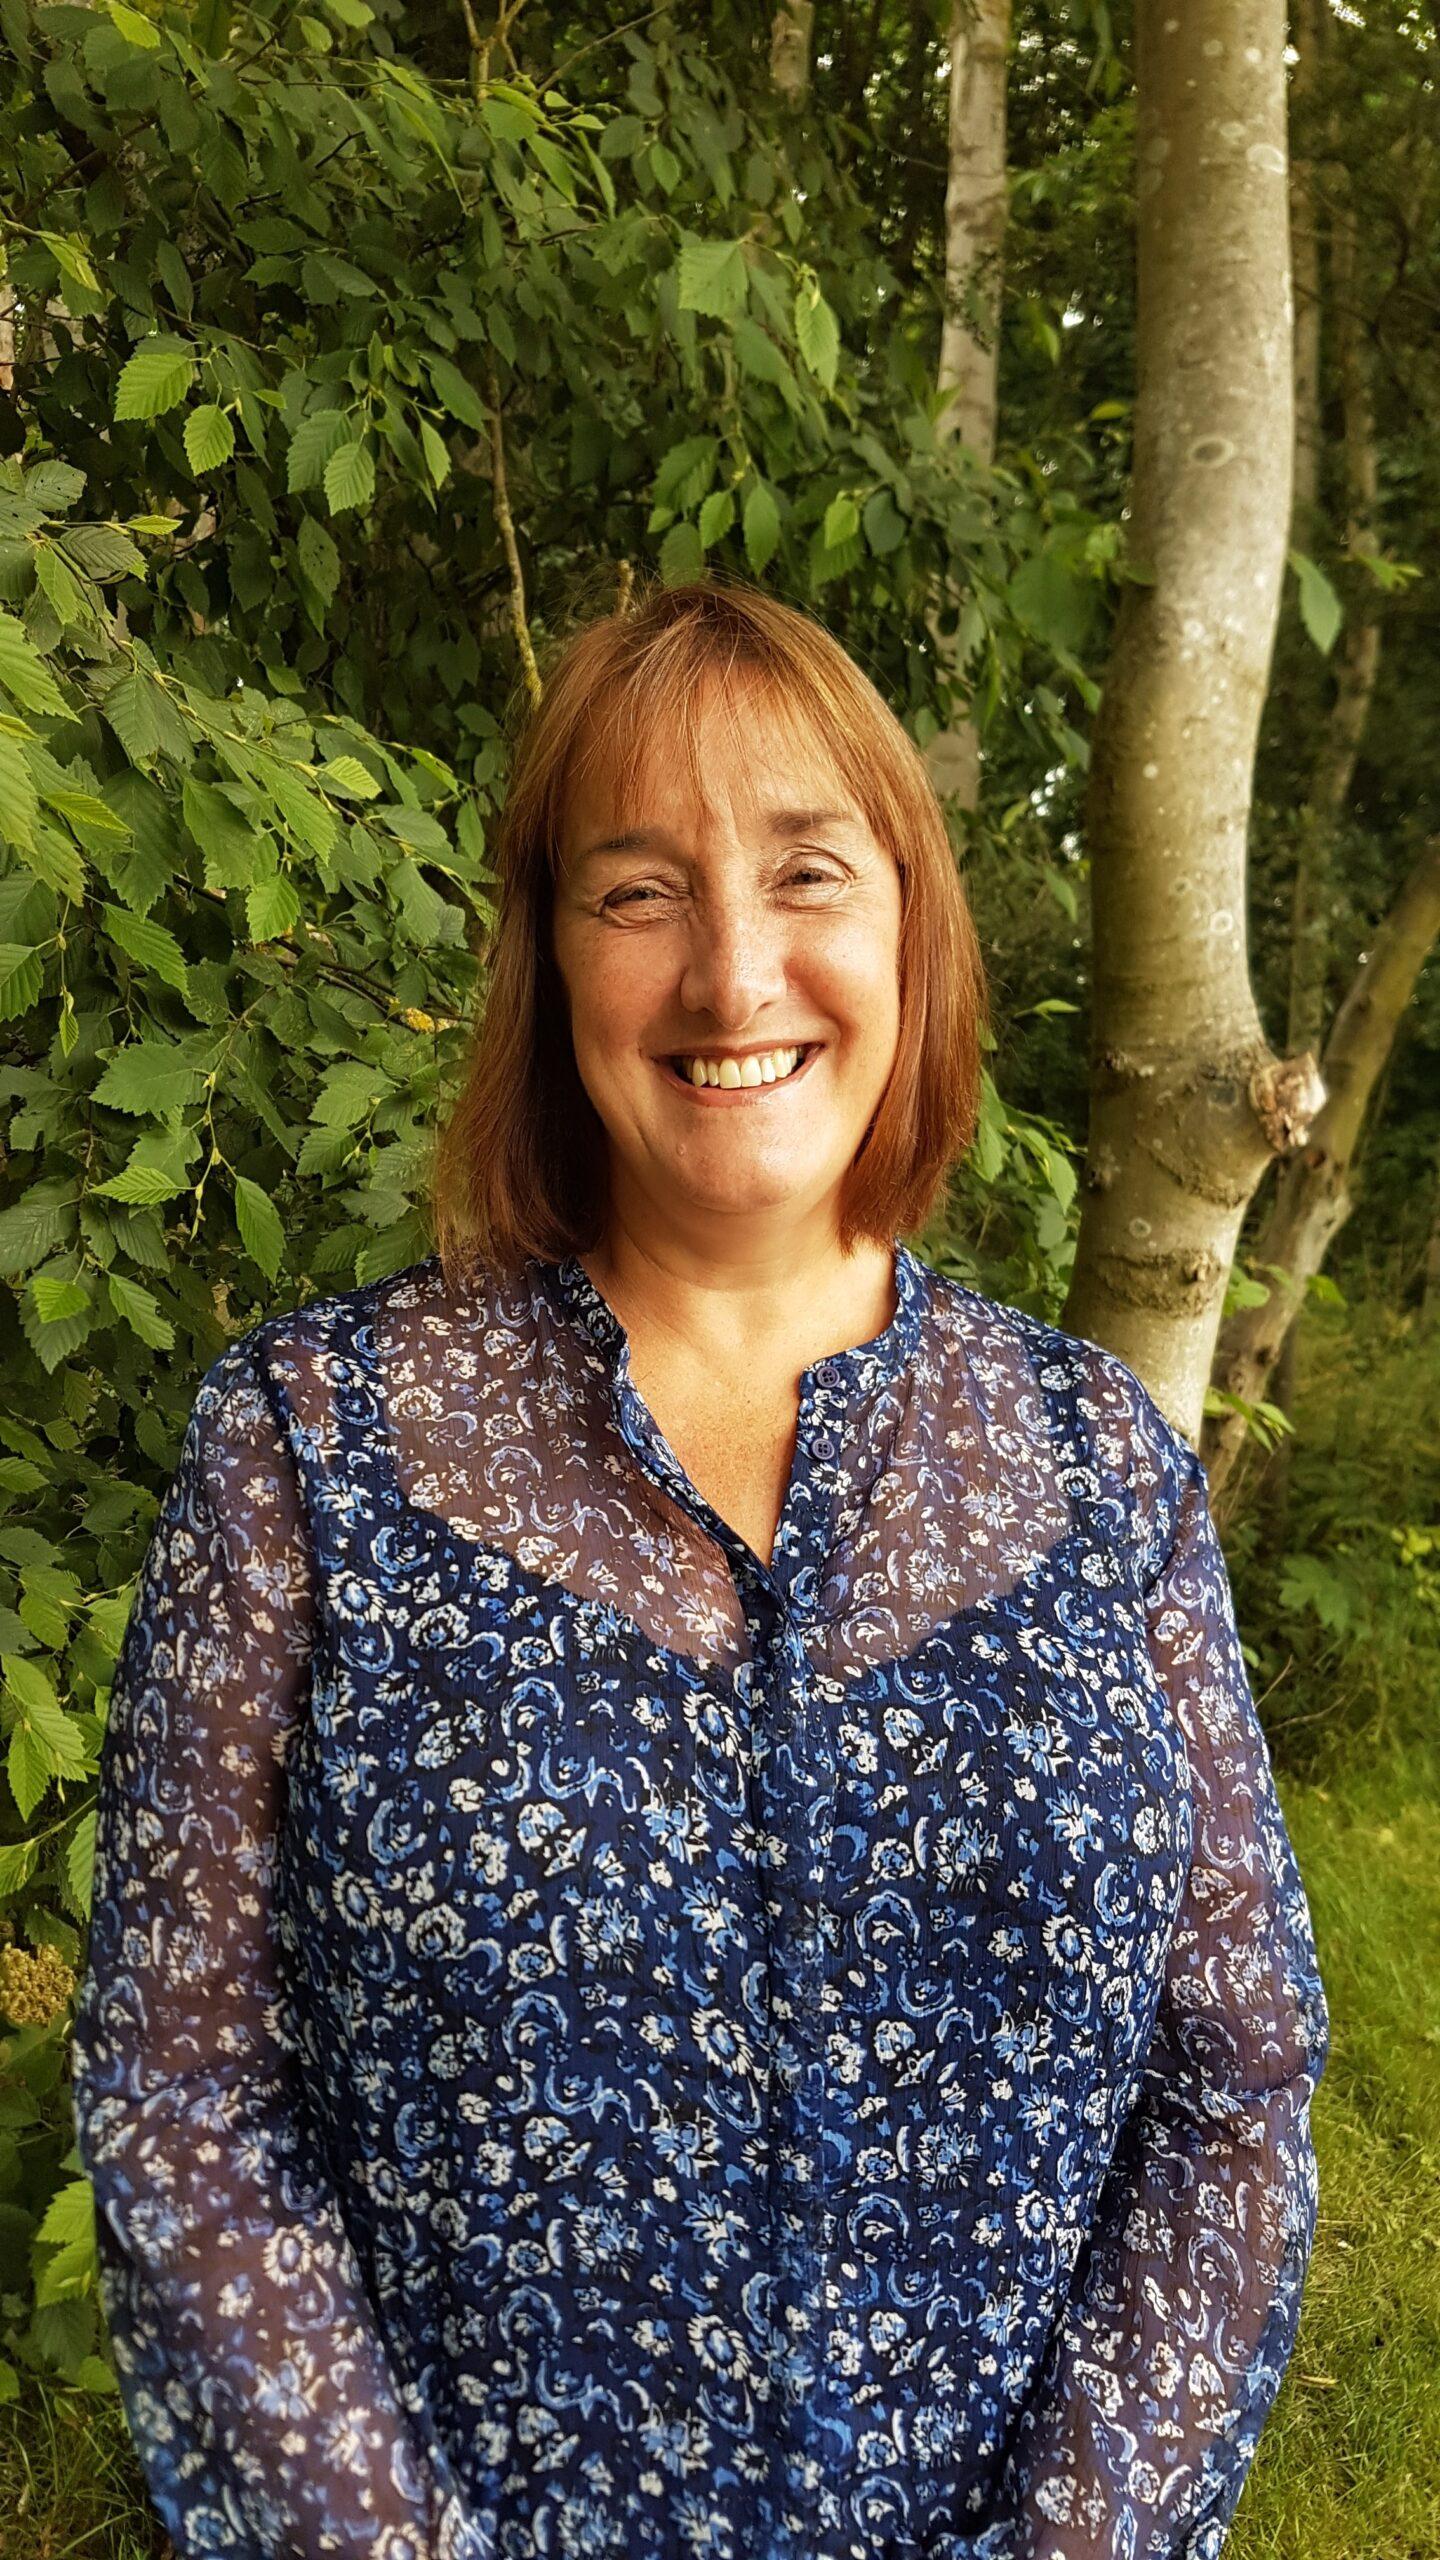 Paula Gibbons, Head of Service for Adopt Coast to Coast